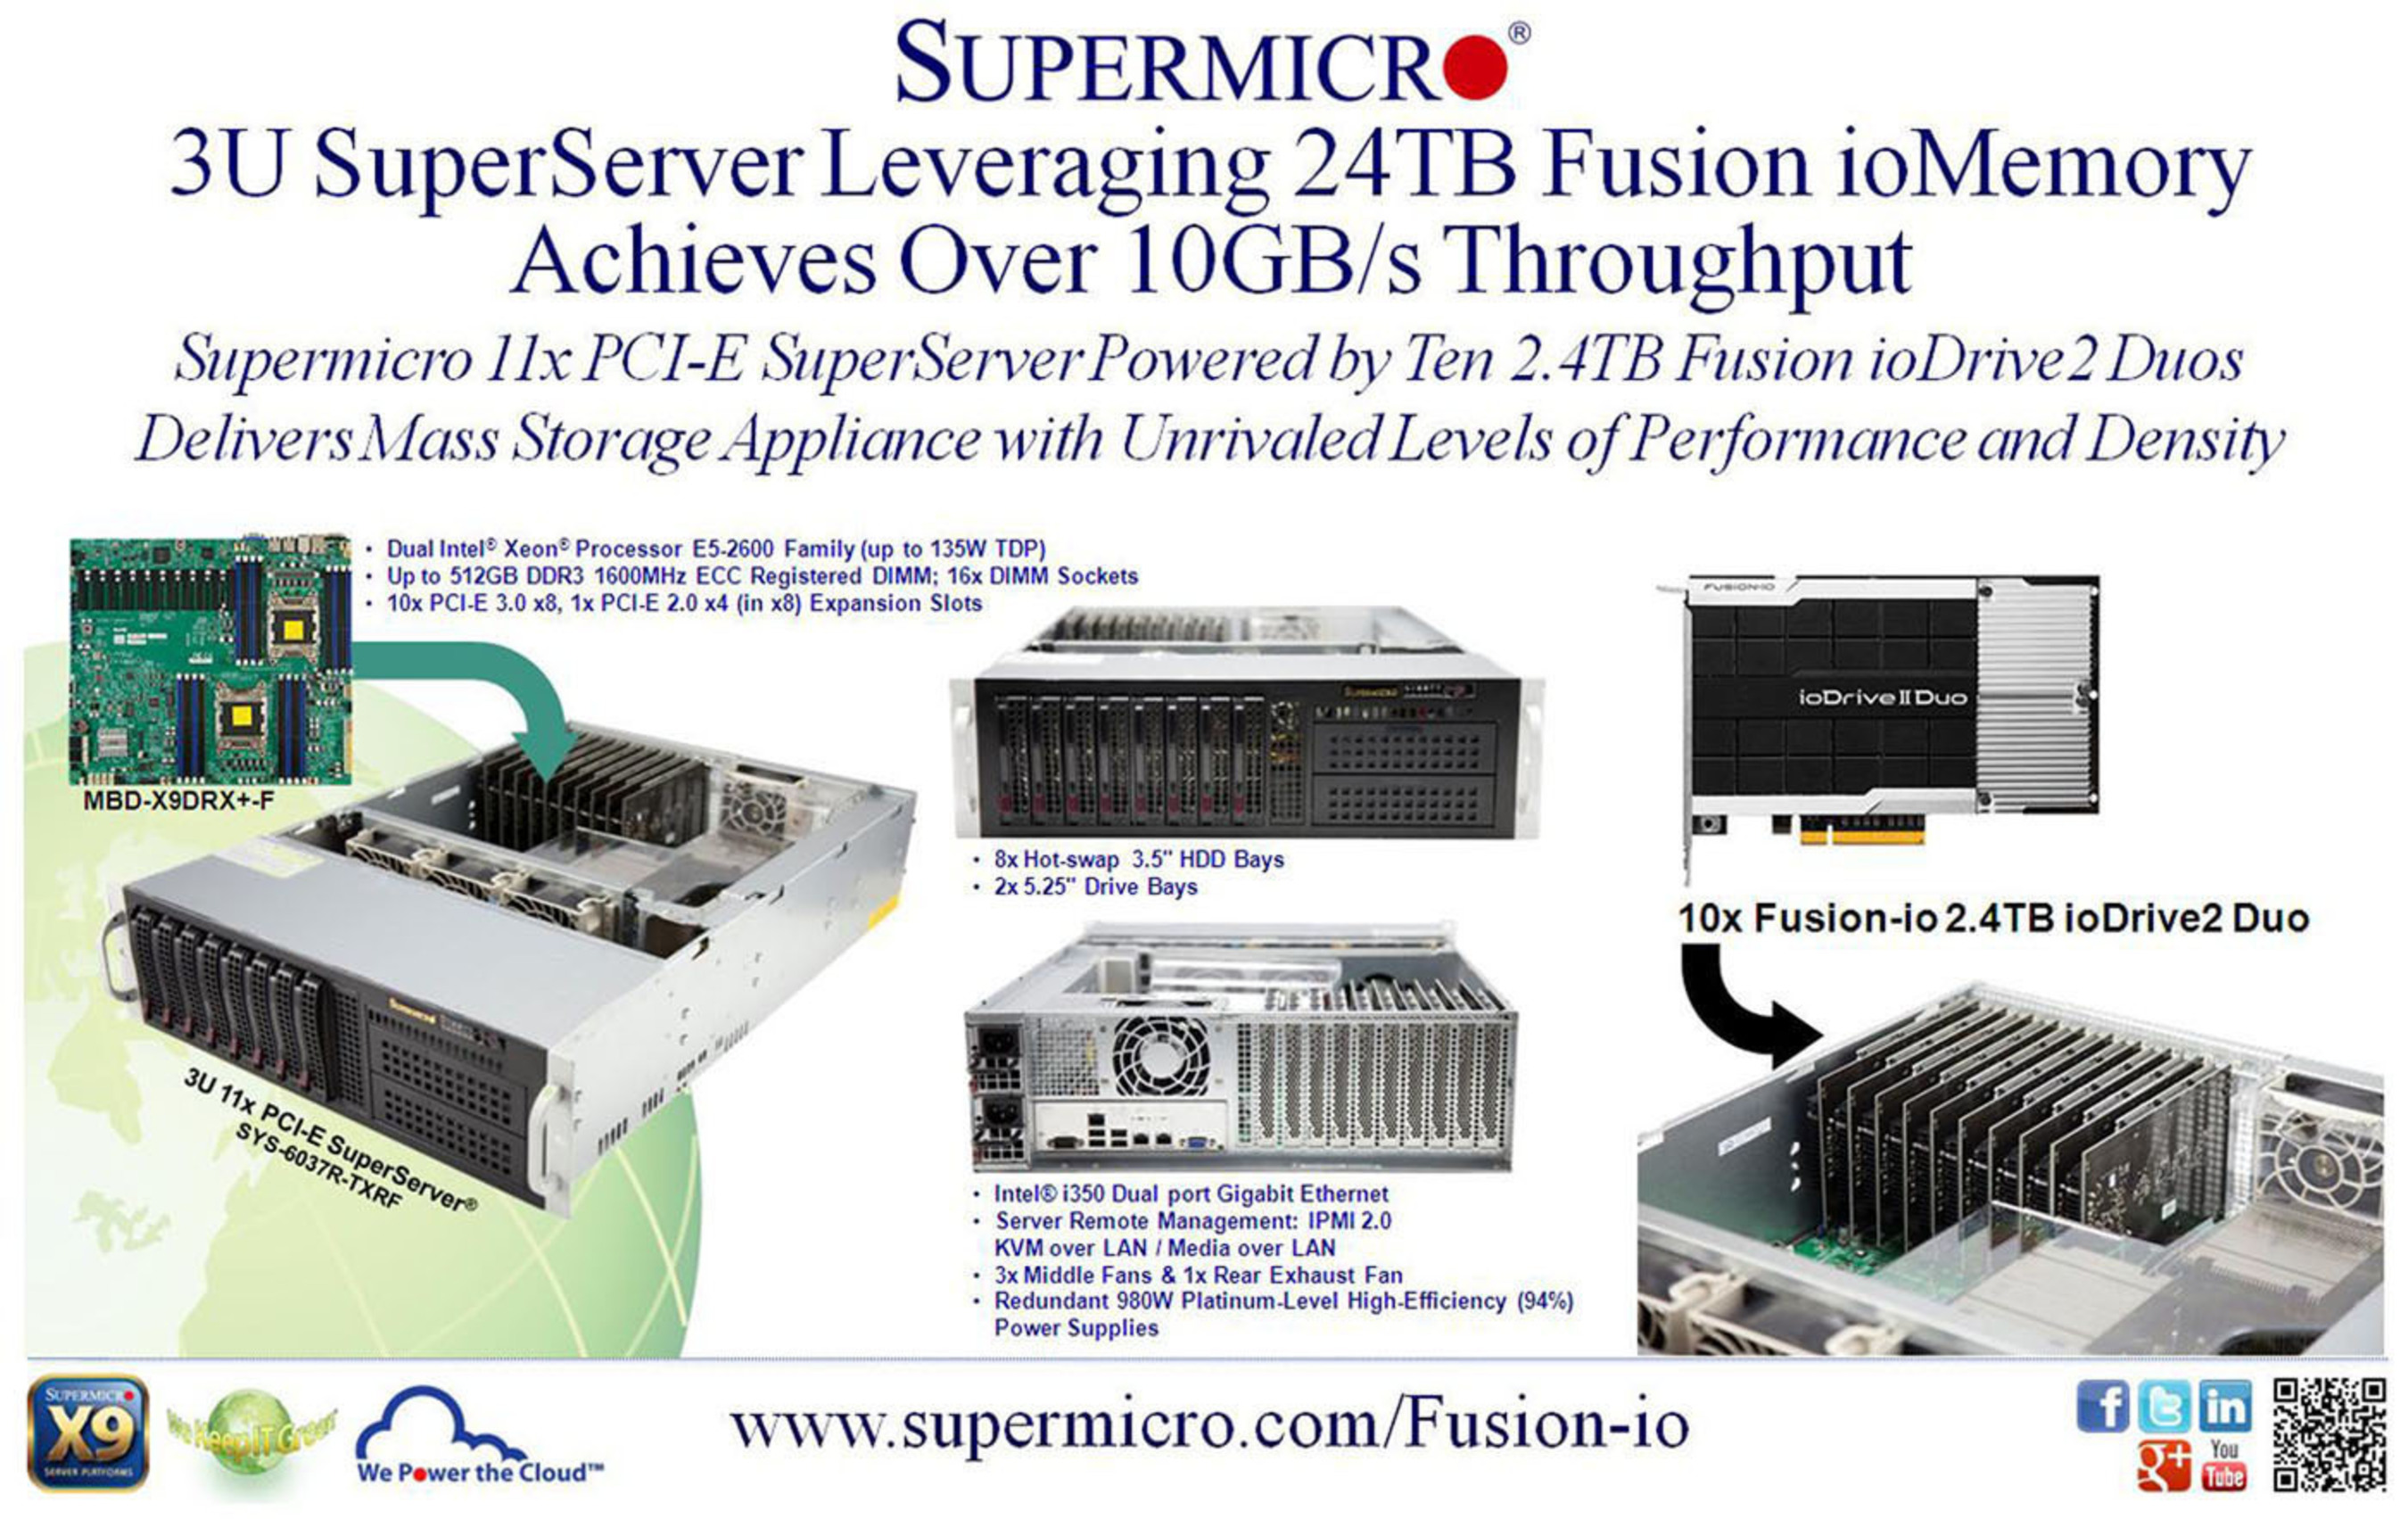 Supermicro(R) 3U SuperServer(R) w/Fusion ioMemory Achieves Over 10GB/s Throughput.  (PRNewsFoto/Super Micro ...